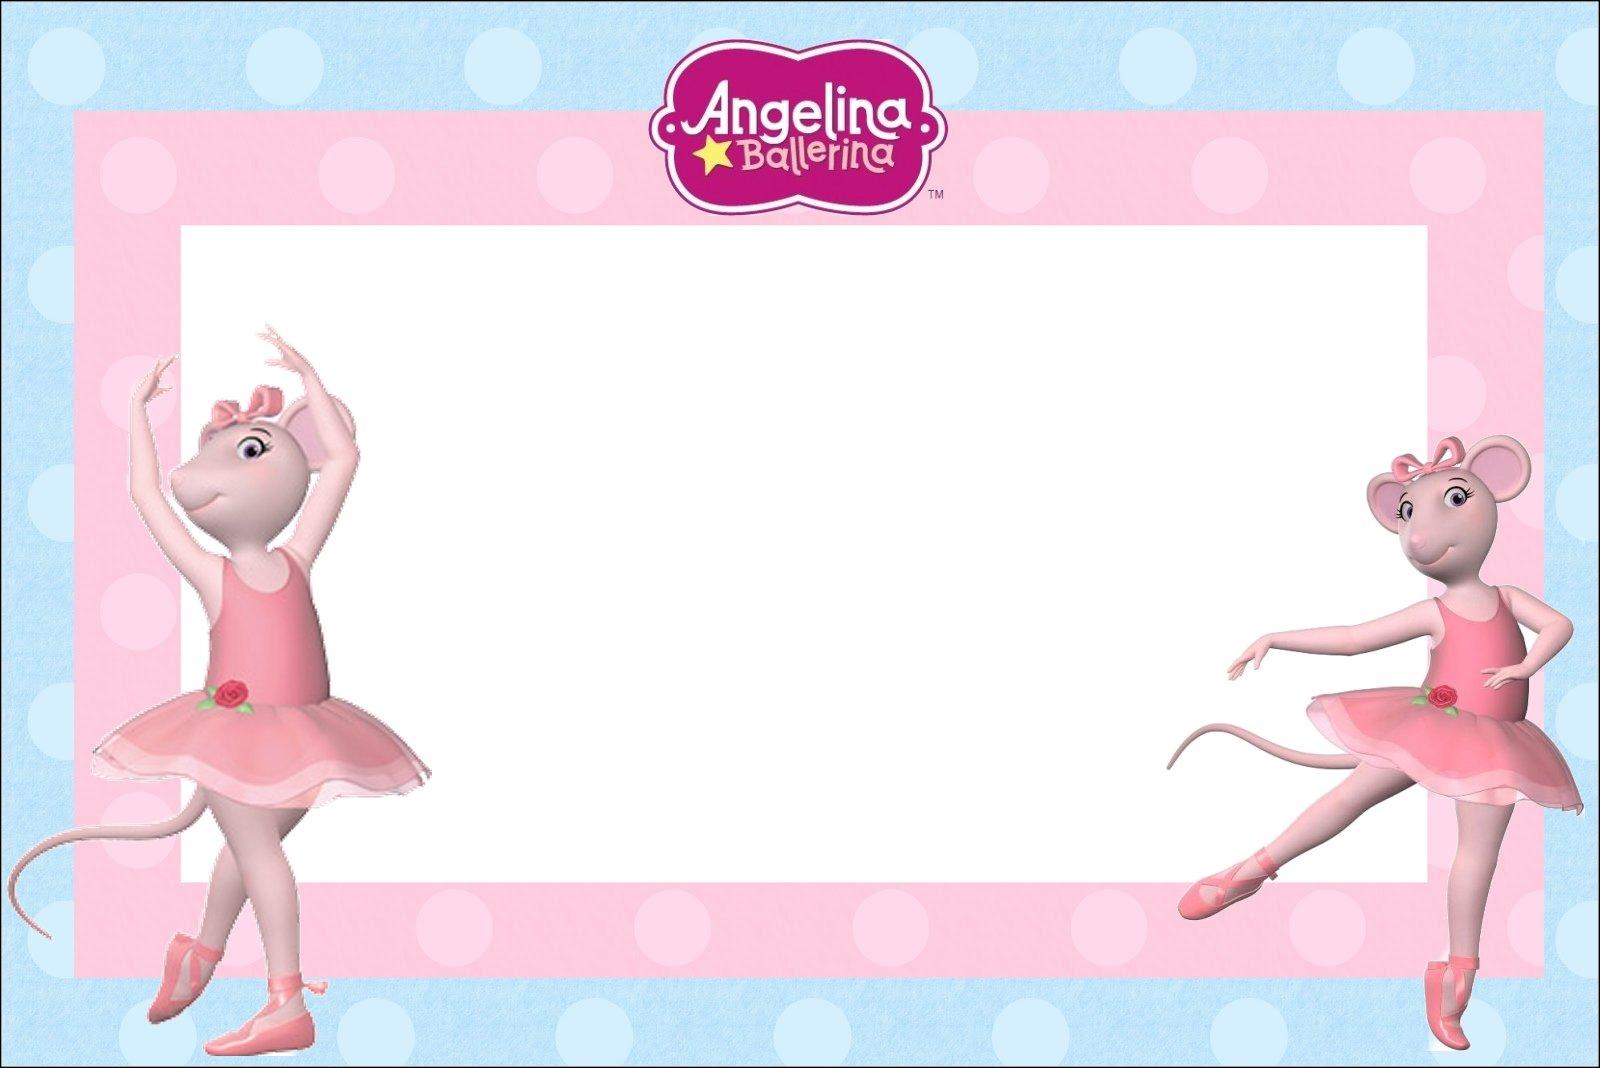 Kit Para Imprimir Da Angelina Ballerina Dicas Pra Mamae